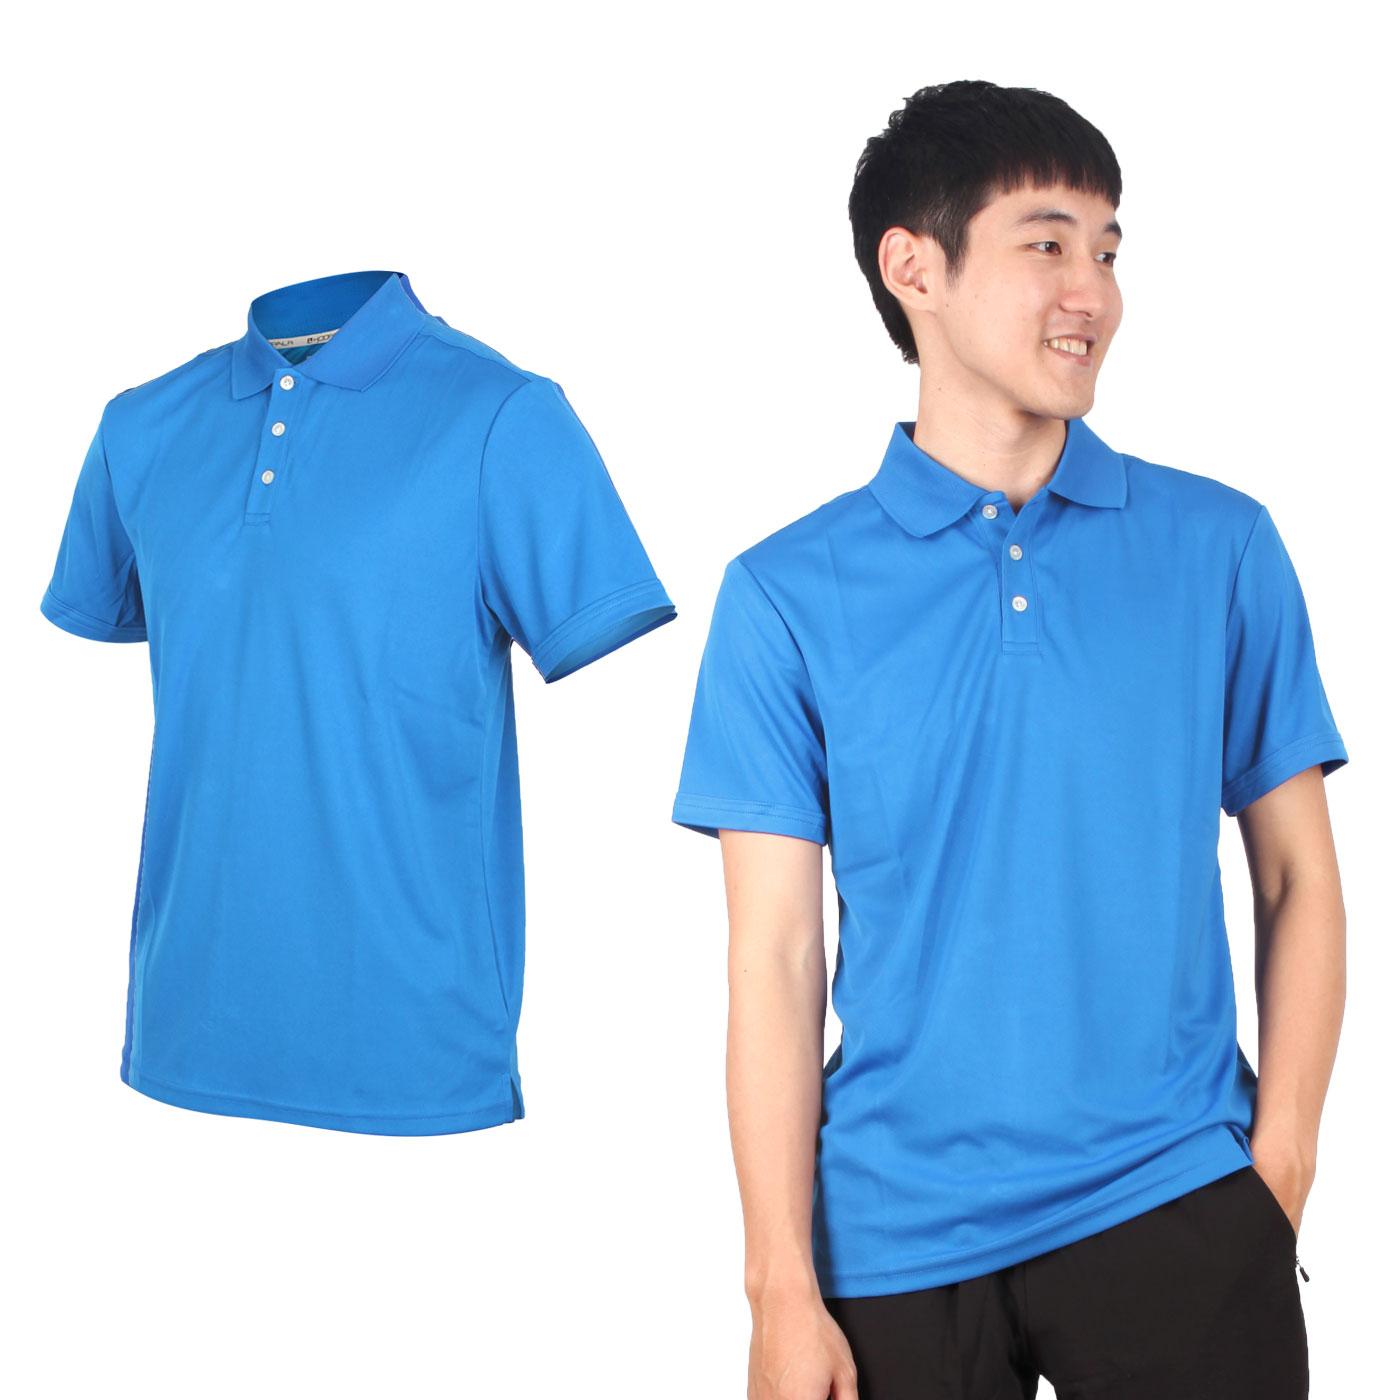 HODARLA 星際吸濕排汗短袖POLO衫 3151501 - 亮藍